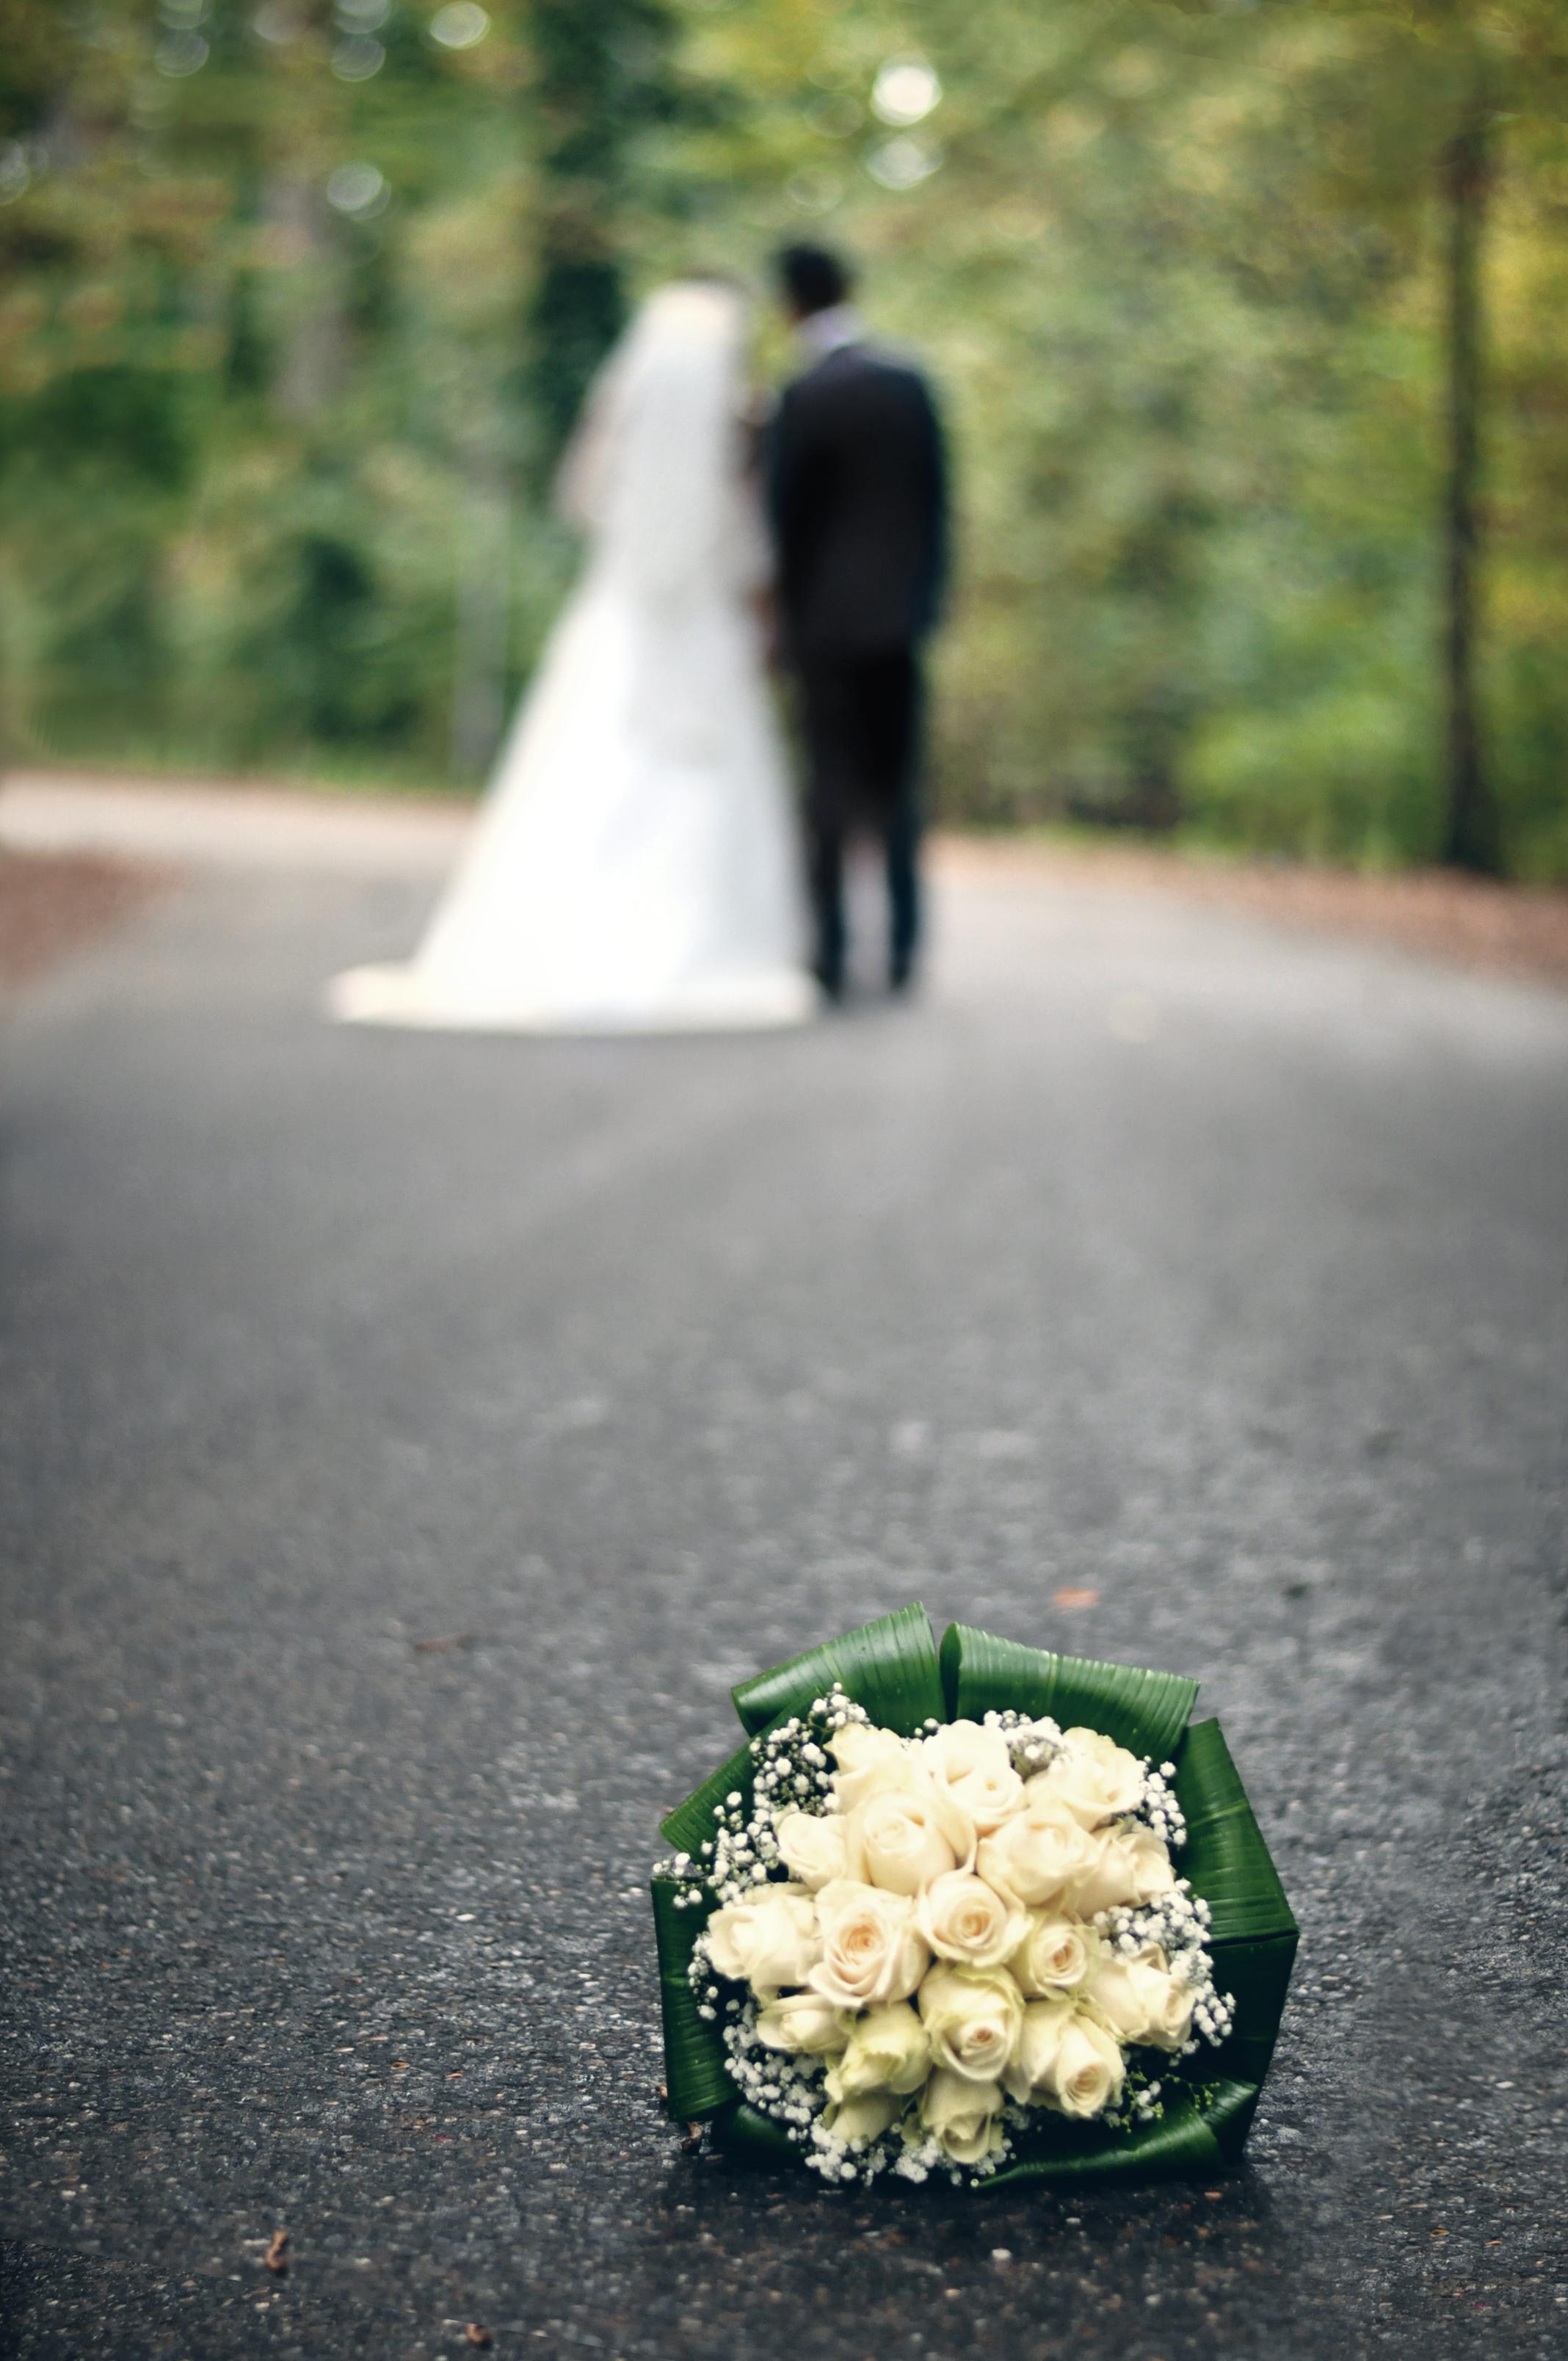 Wedding Photography - Trouwfotografie - Huwelijkfotograaf, huwelijk amsterdam, fotograaf amsterdam, trouwfotografie, Bruidsfotografie, wedding photographer, photographer in Amsterdam